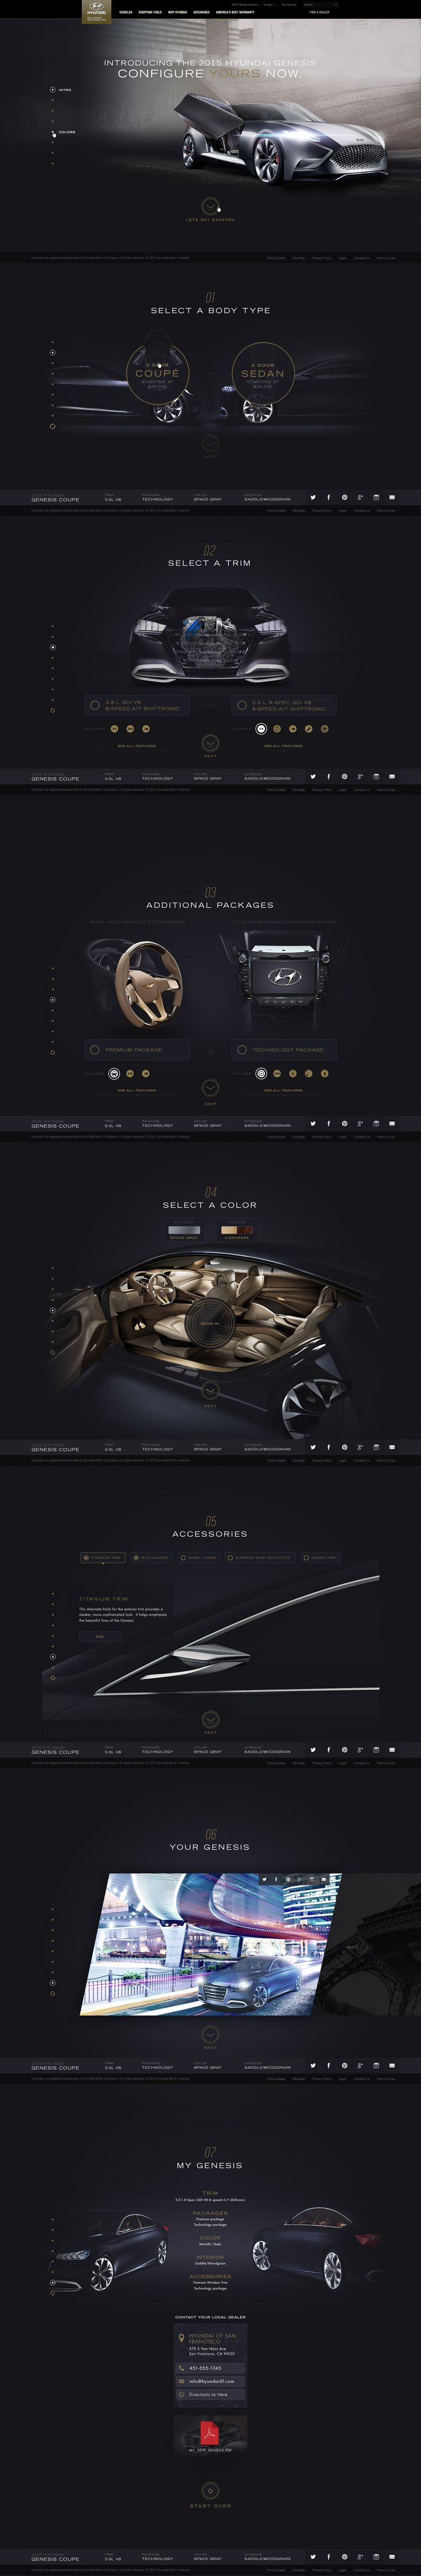 Unique Web Design, Hyundai Genesis #WebDesign #Design (http://www.pinterest.com/aldenchong/)